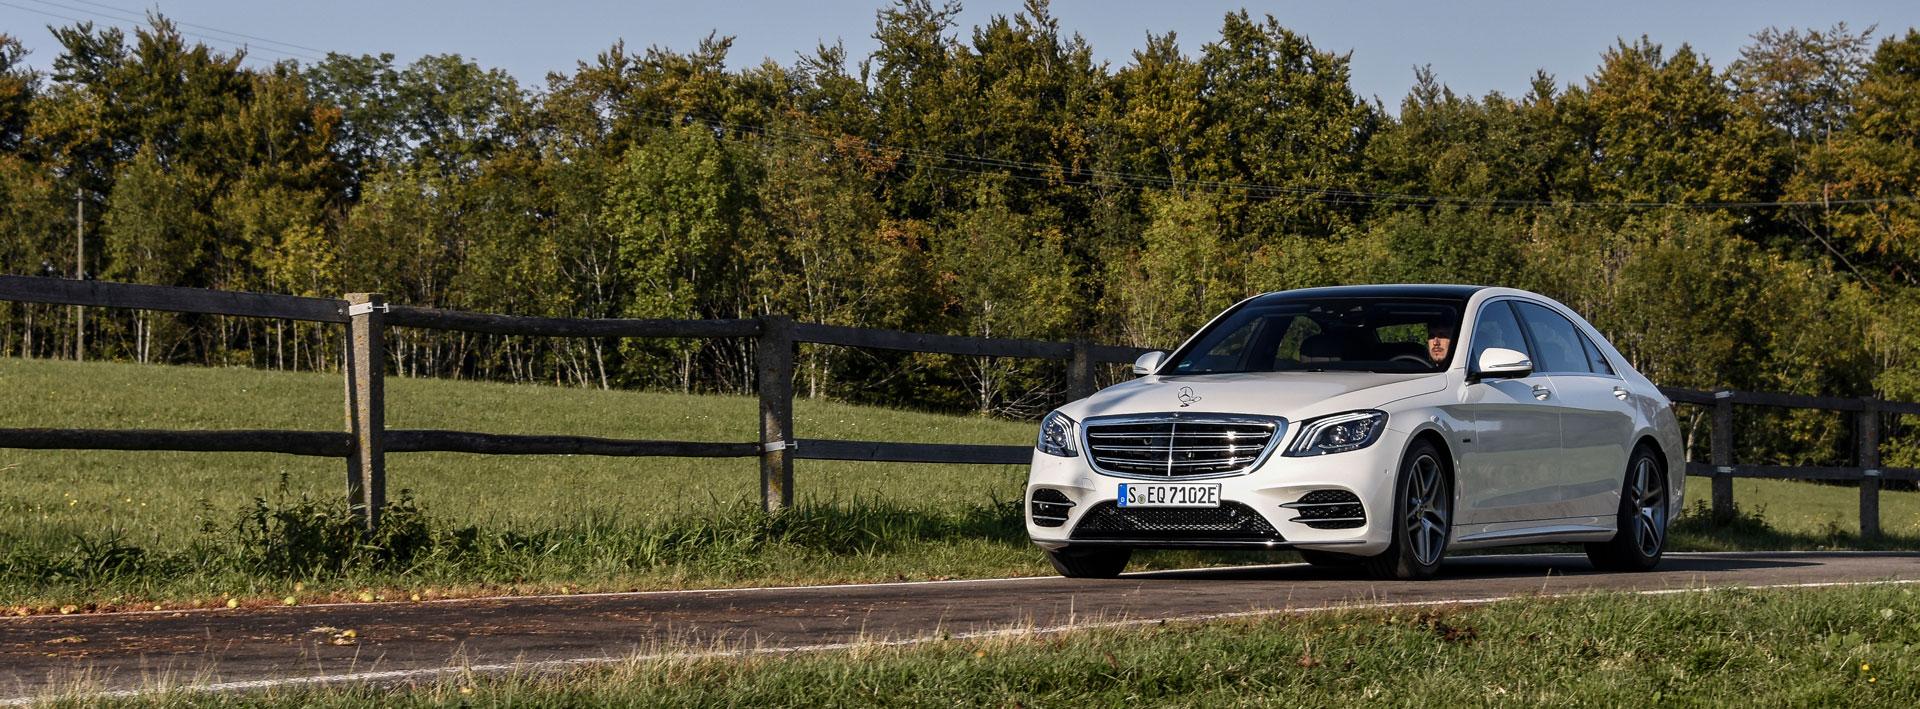 Унікальні умови на покупку Mercedes-Benz S-Class